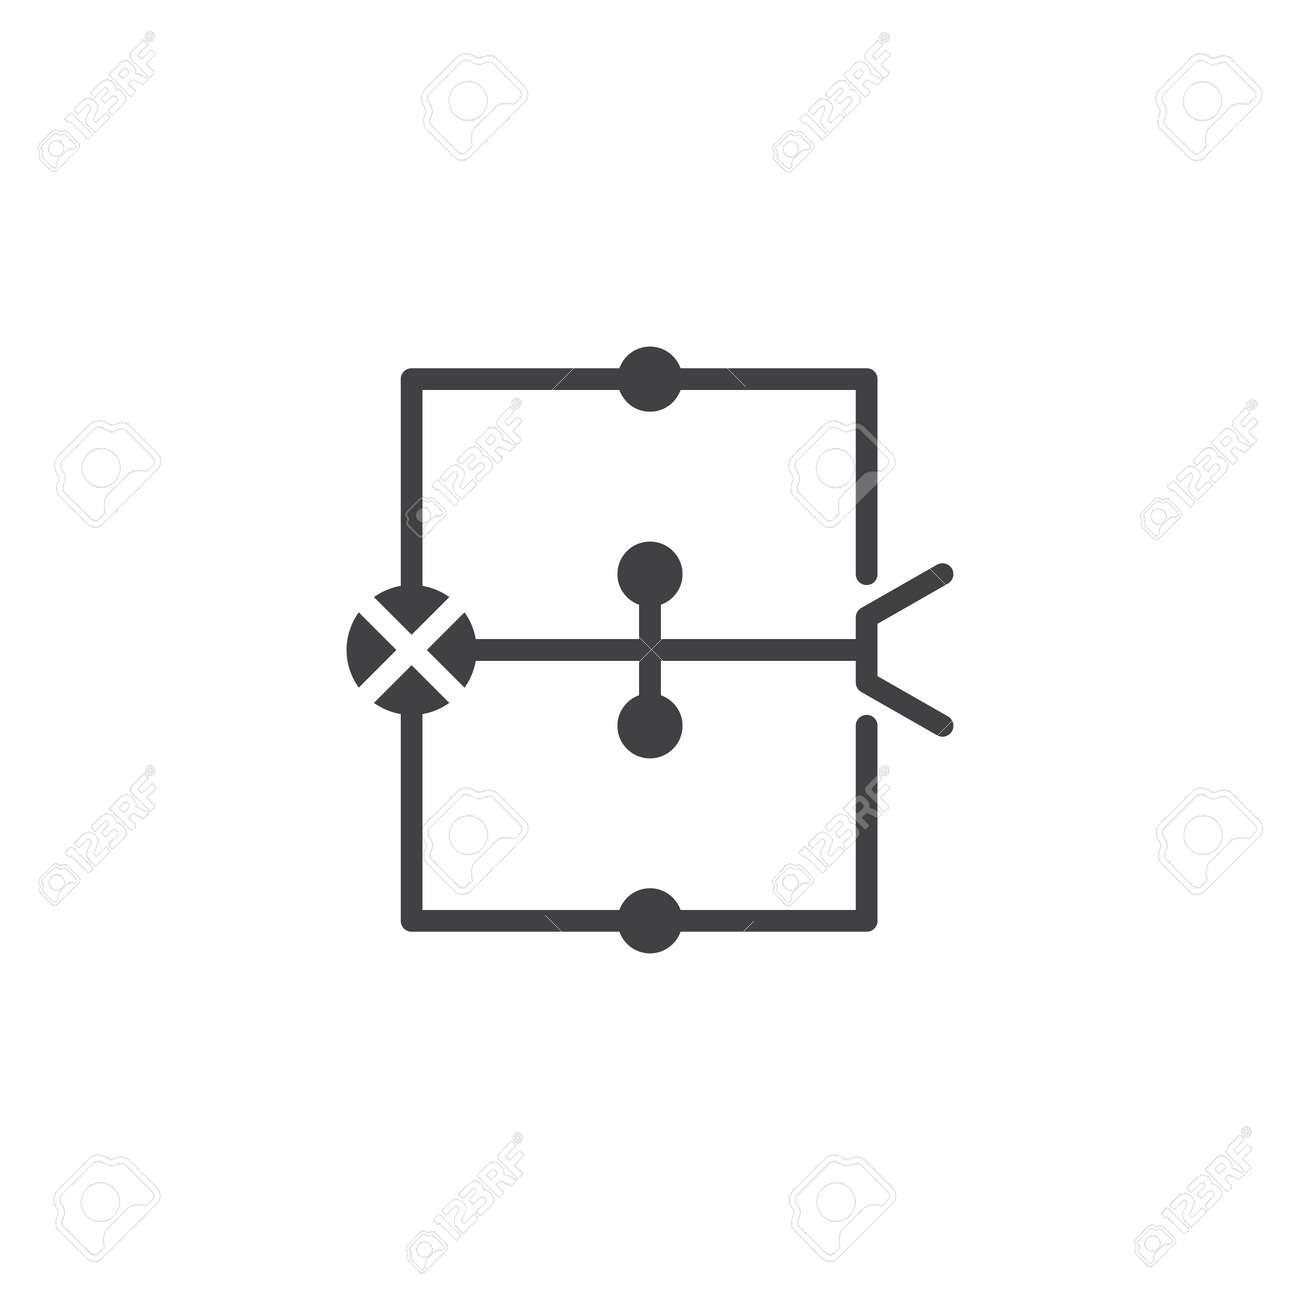 Wiring diagram icon vector, filled flat sign, solid pictogram isolated on housing scheme, blue scheme, filter scheme,